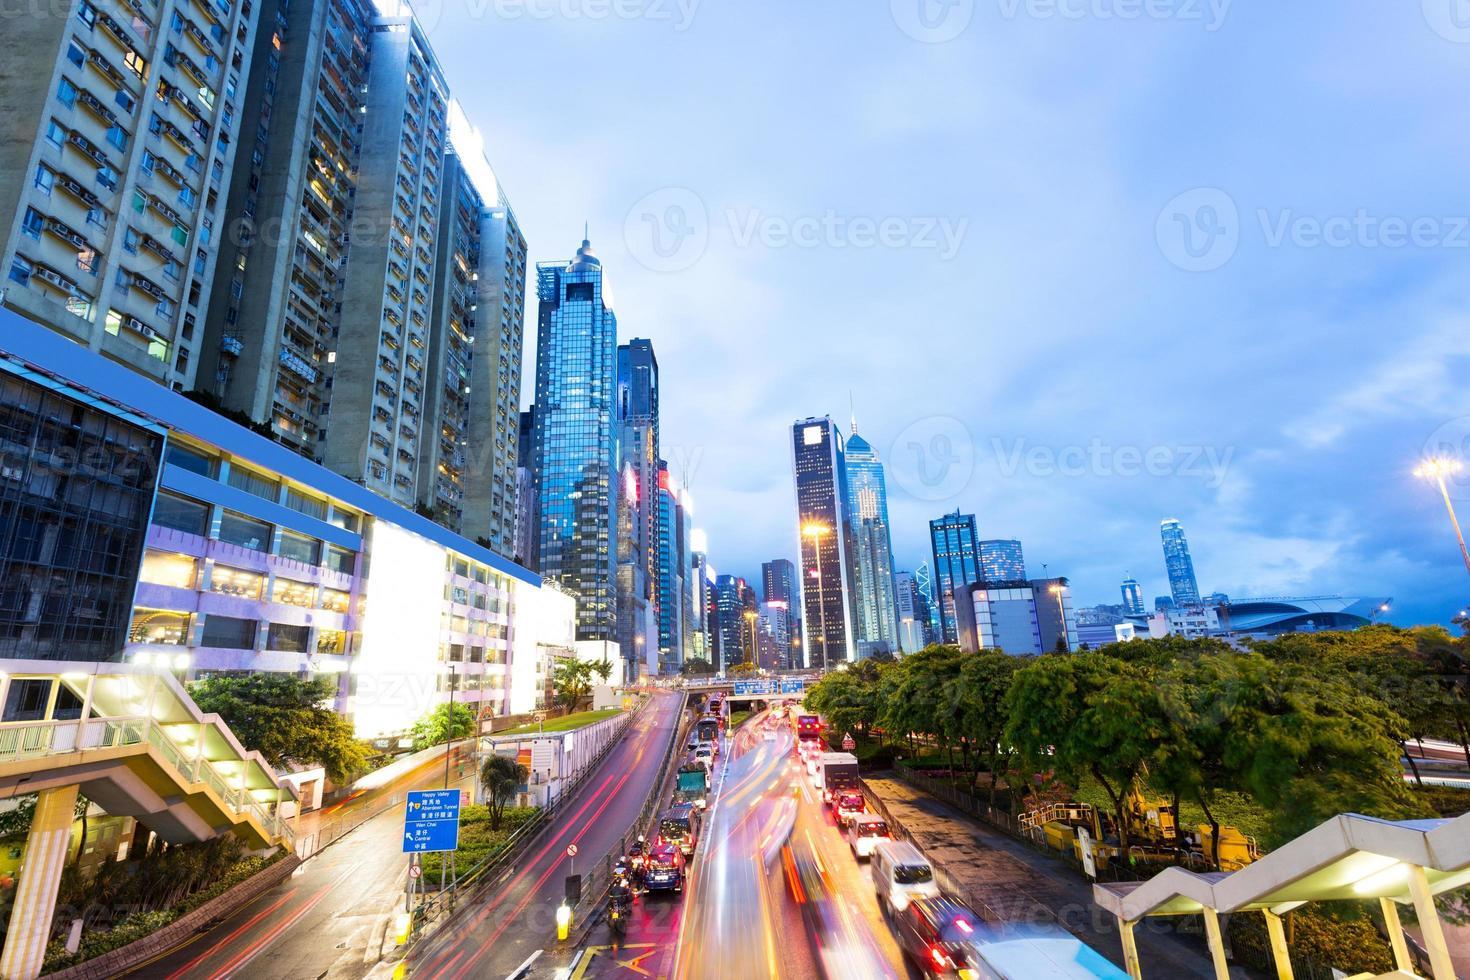 traffico nella città moderna di notte foto